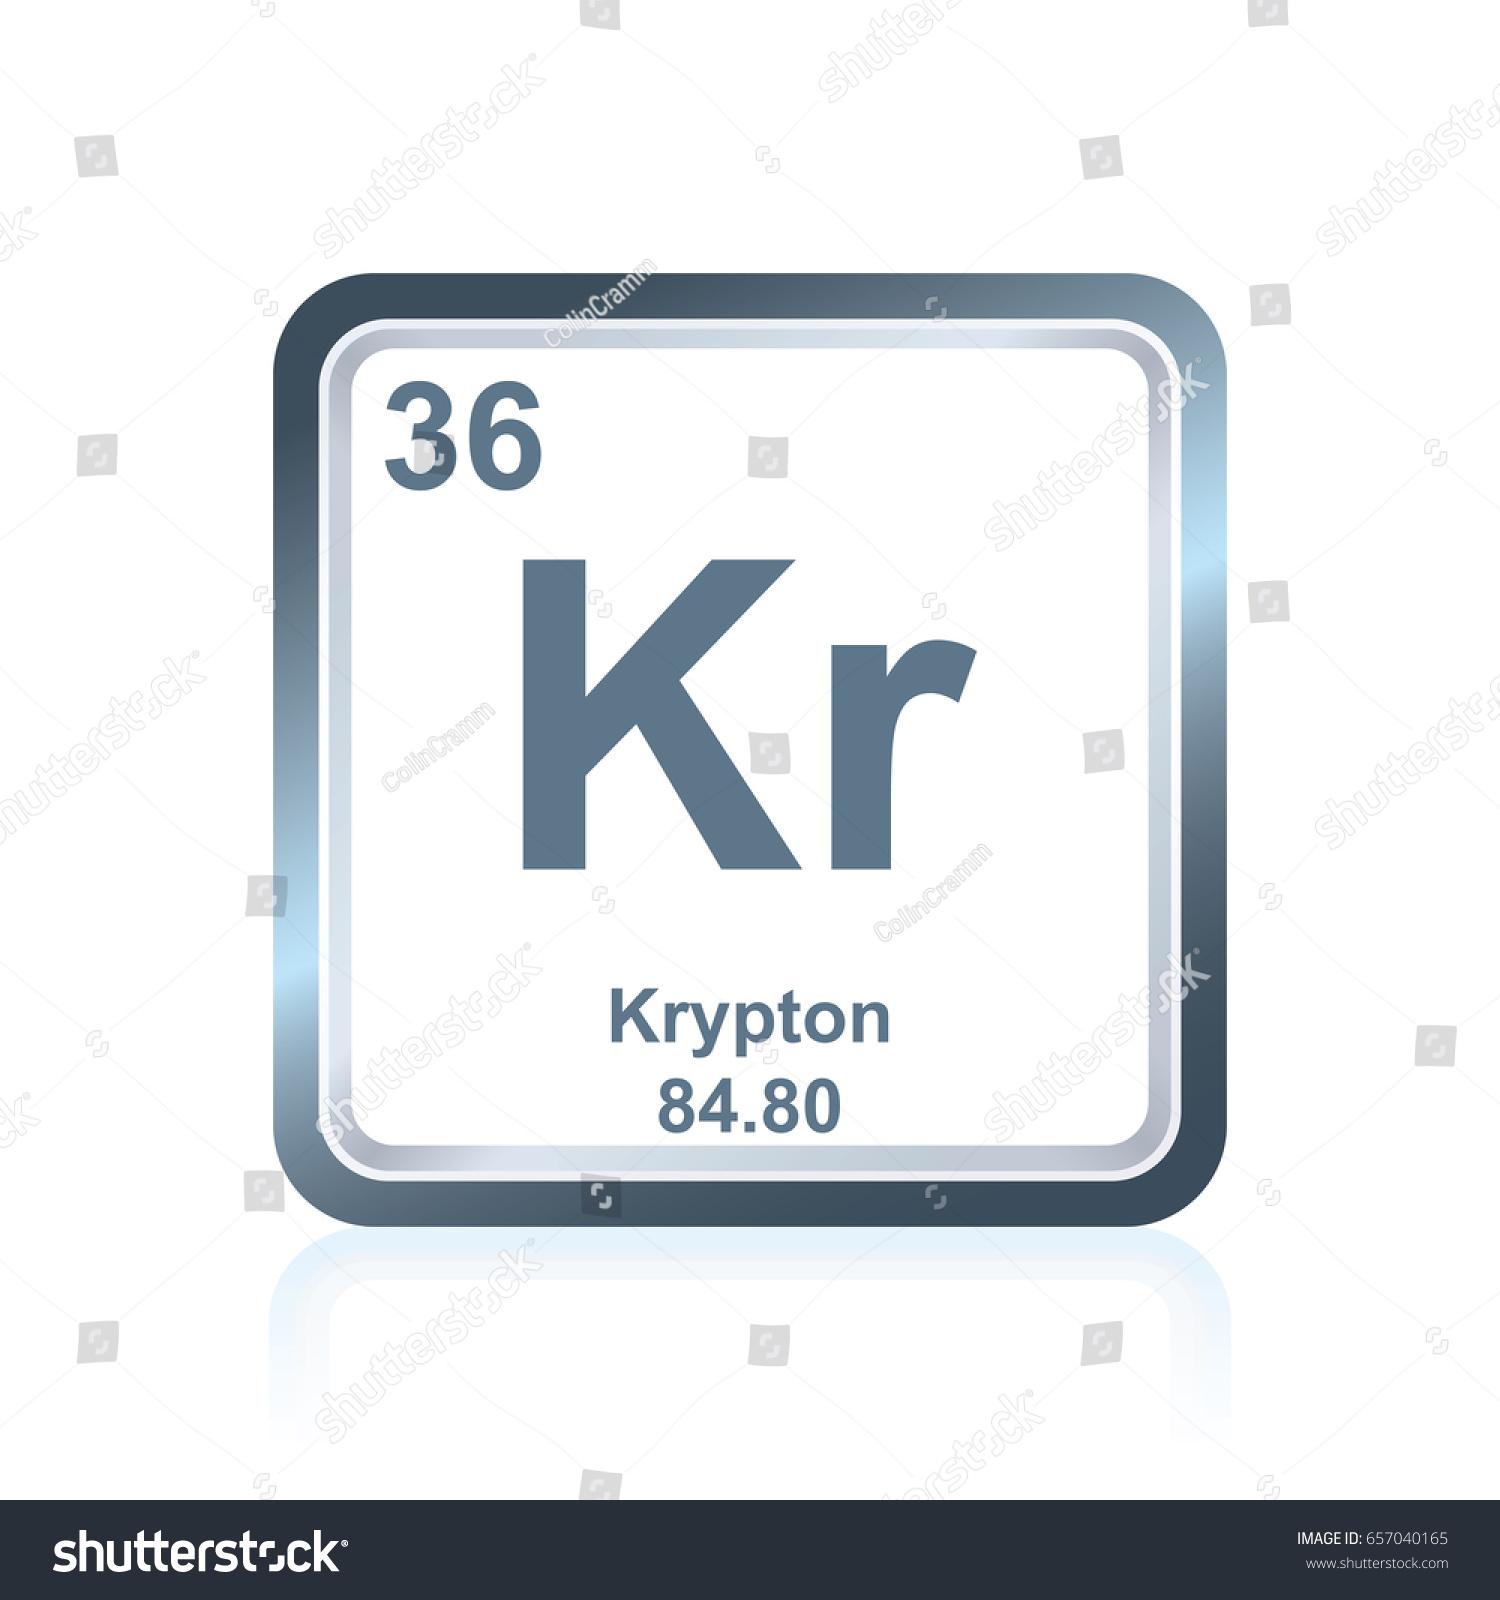 Krypton element periodic table gallery periodic table images krypton element periodic table image collections periodic table krypton symbol periodic table aviongoldcorp symbol chemical element gamestrikefo Choice Image